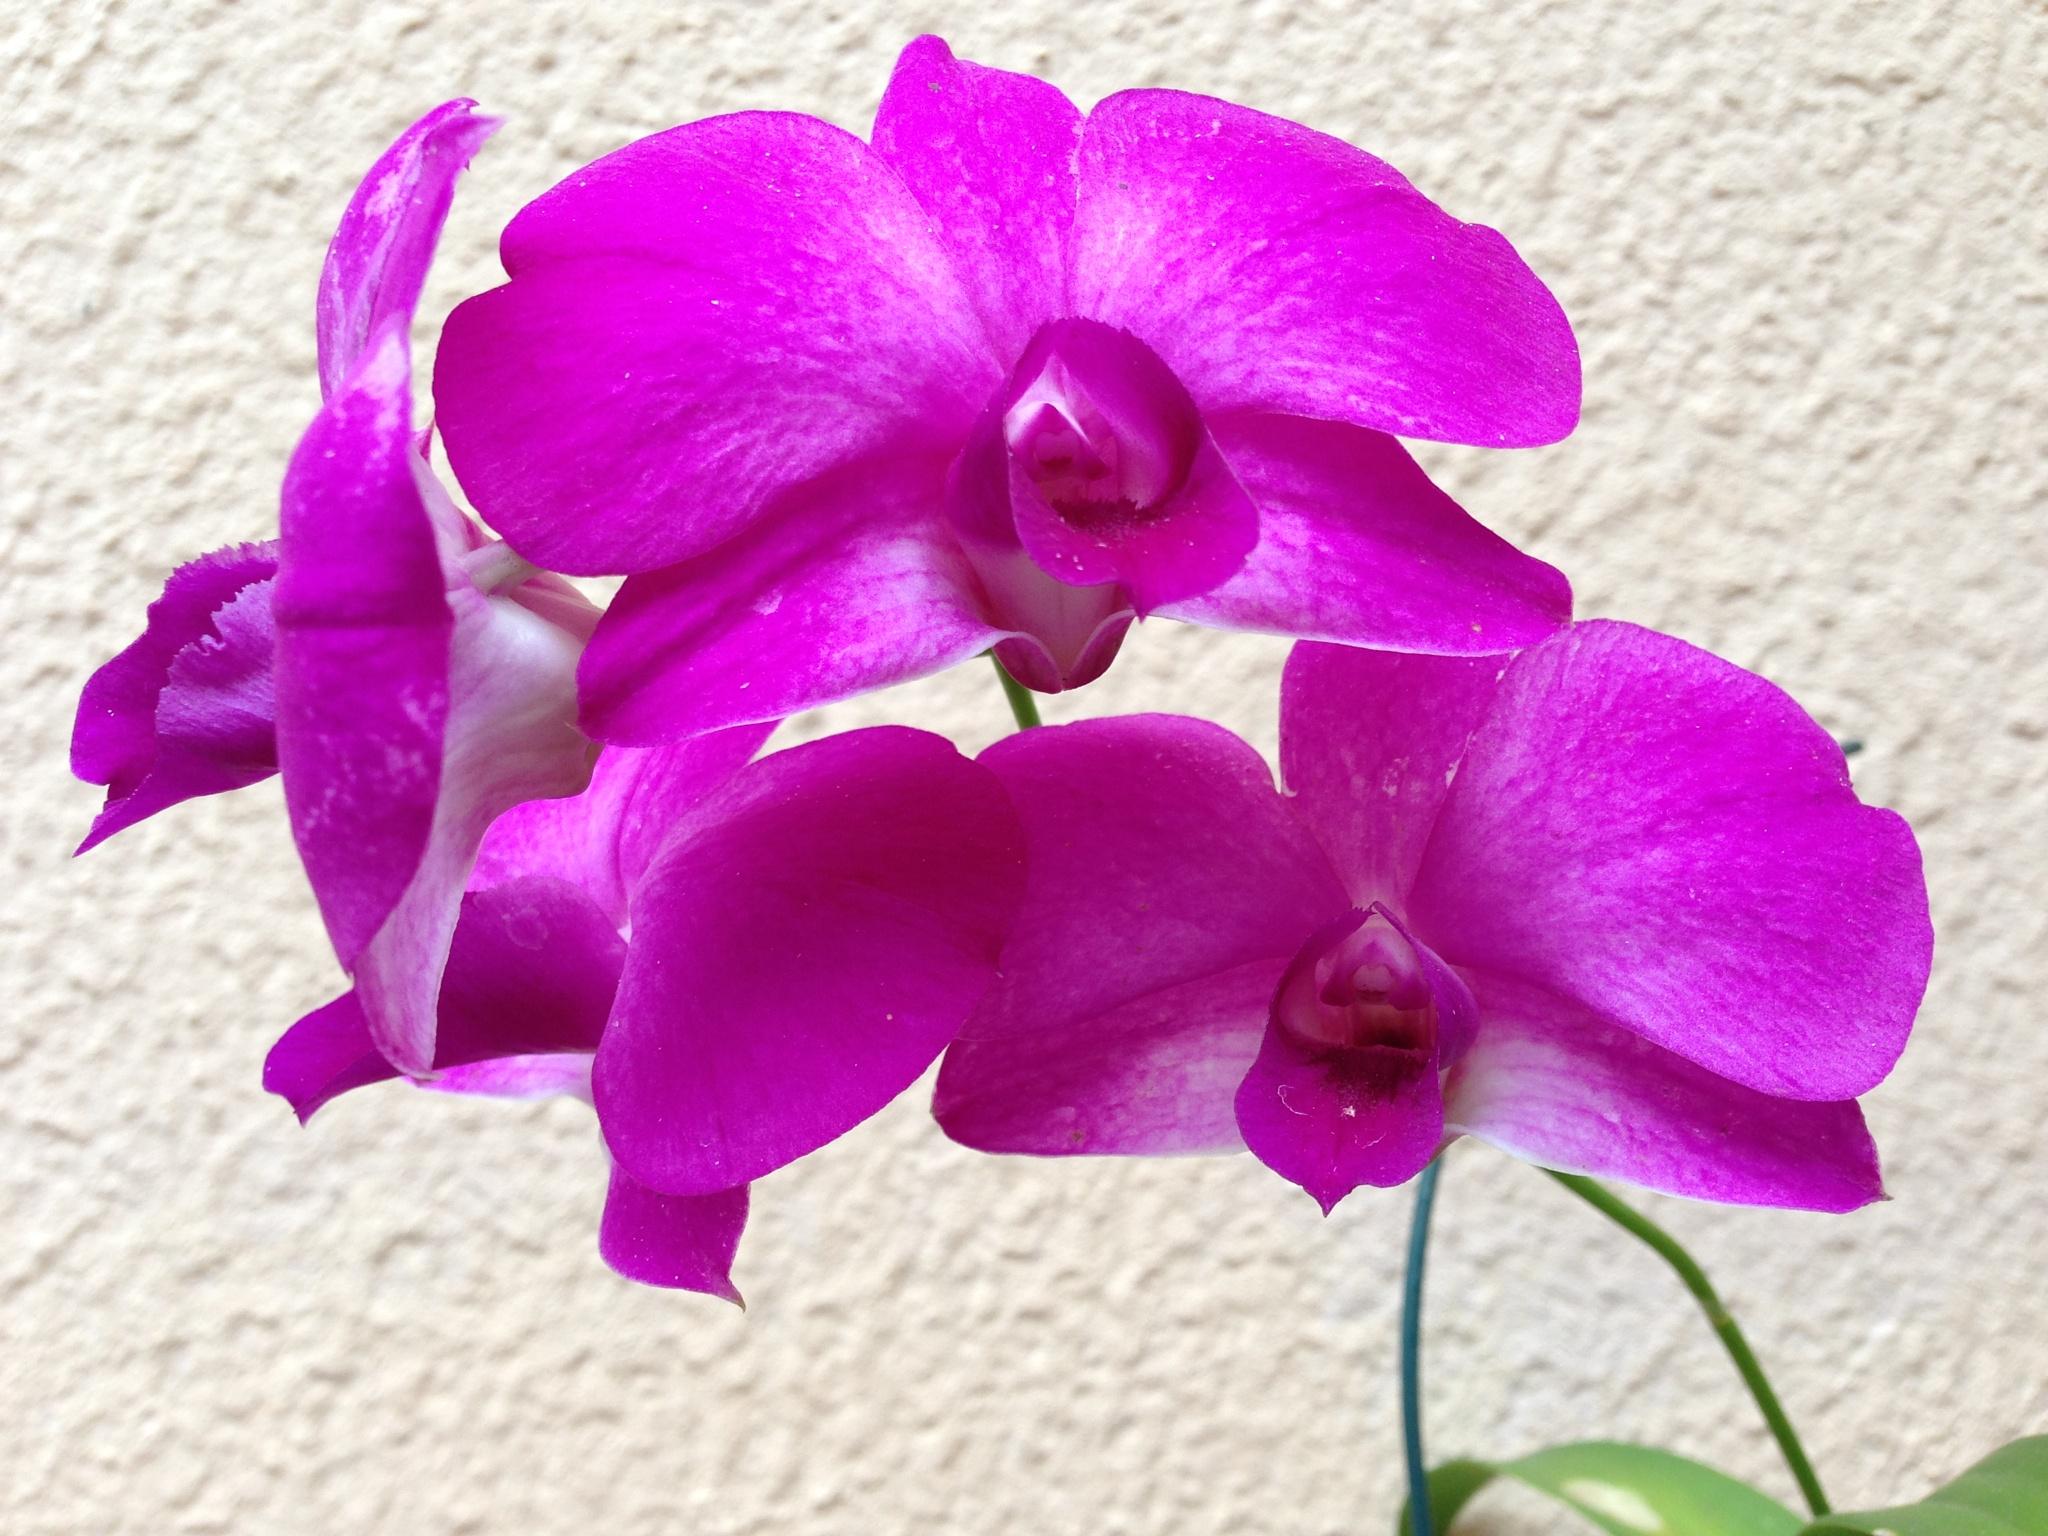 Orquidea by Adriana Silva Bruns